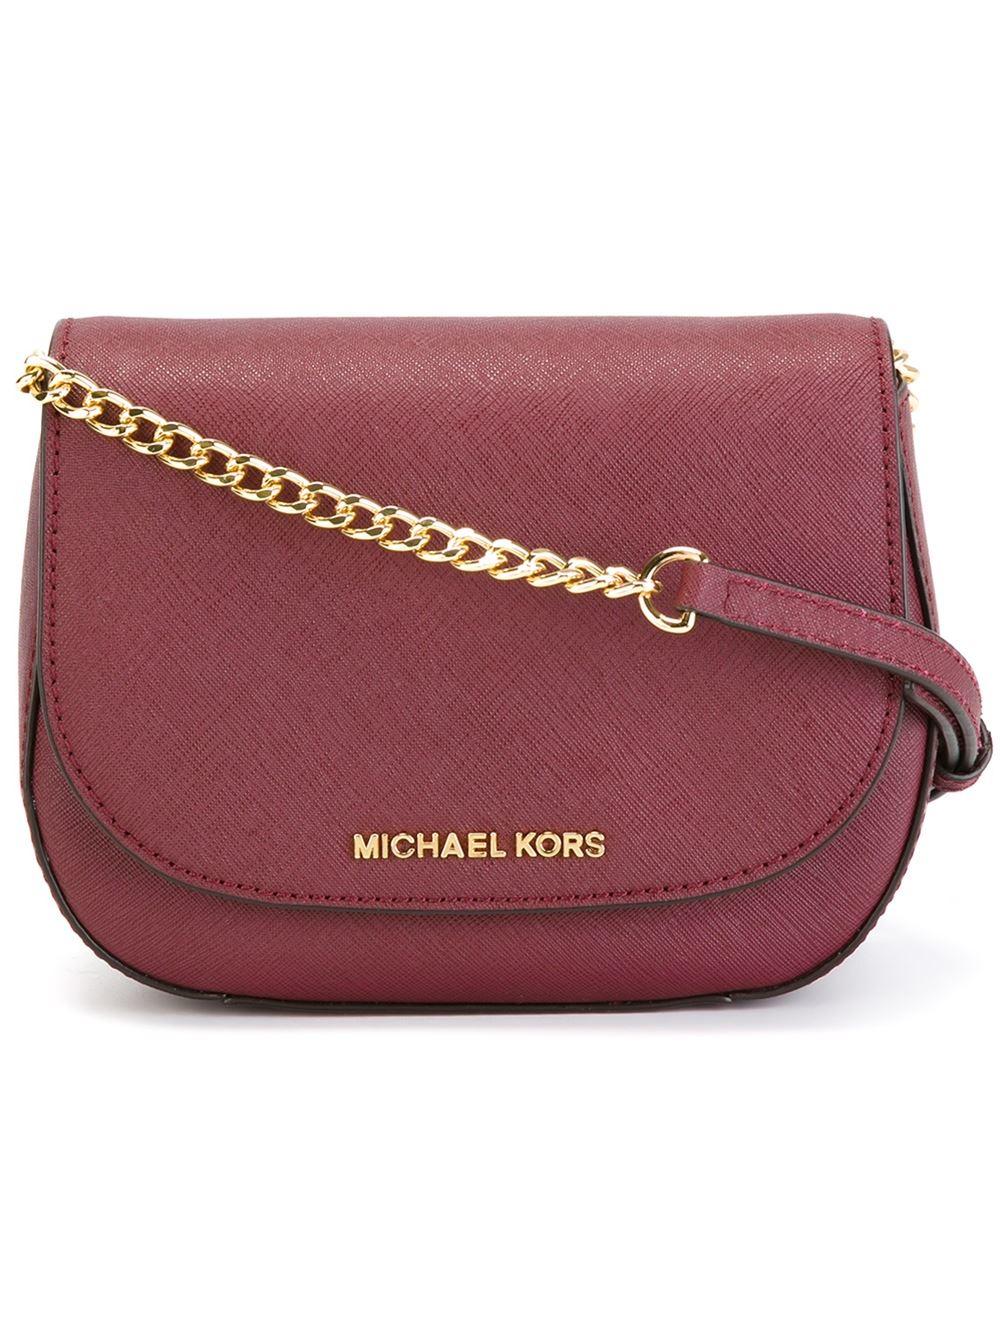 500c0a048078 ... promo code michael michael kors small bedford cross body bag in pink  lyst 8cd39 95e0f